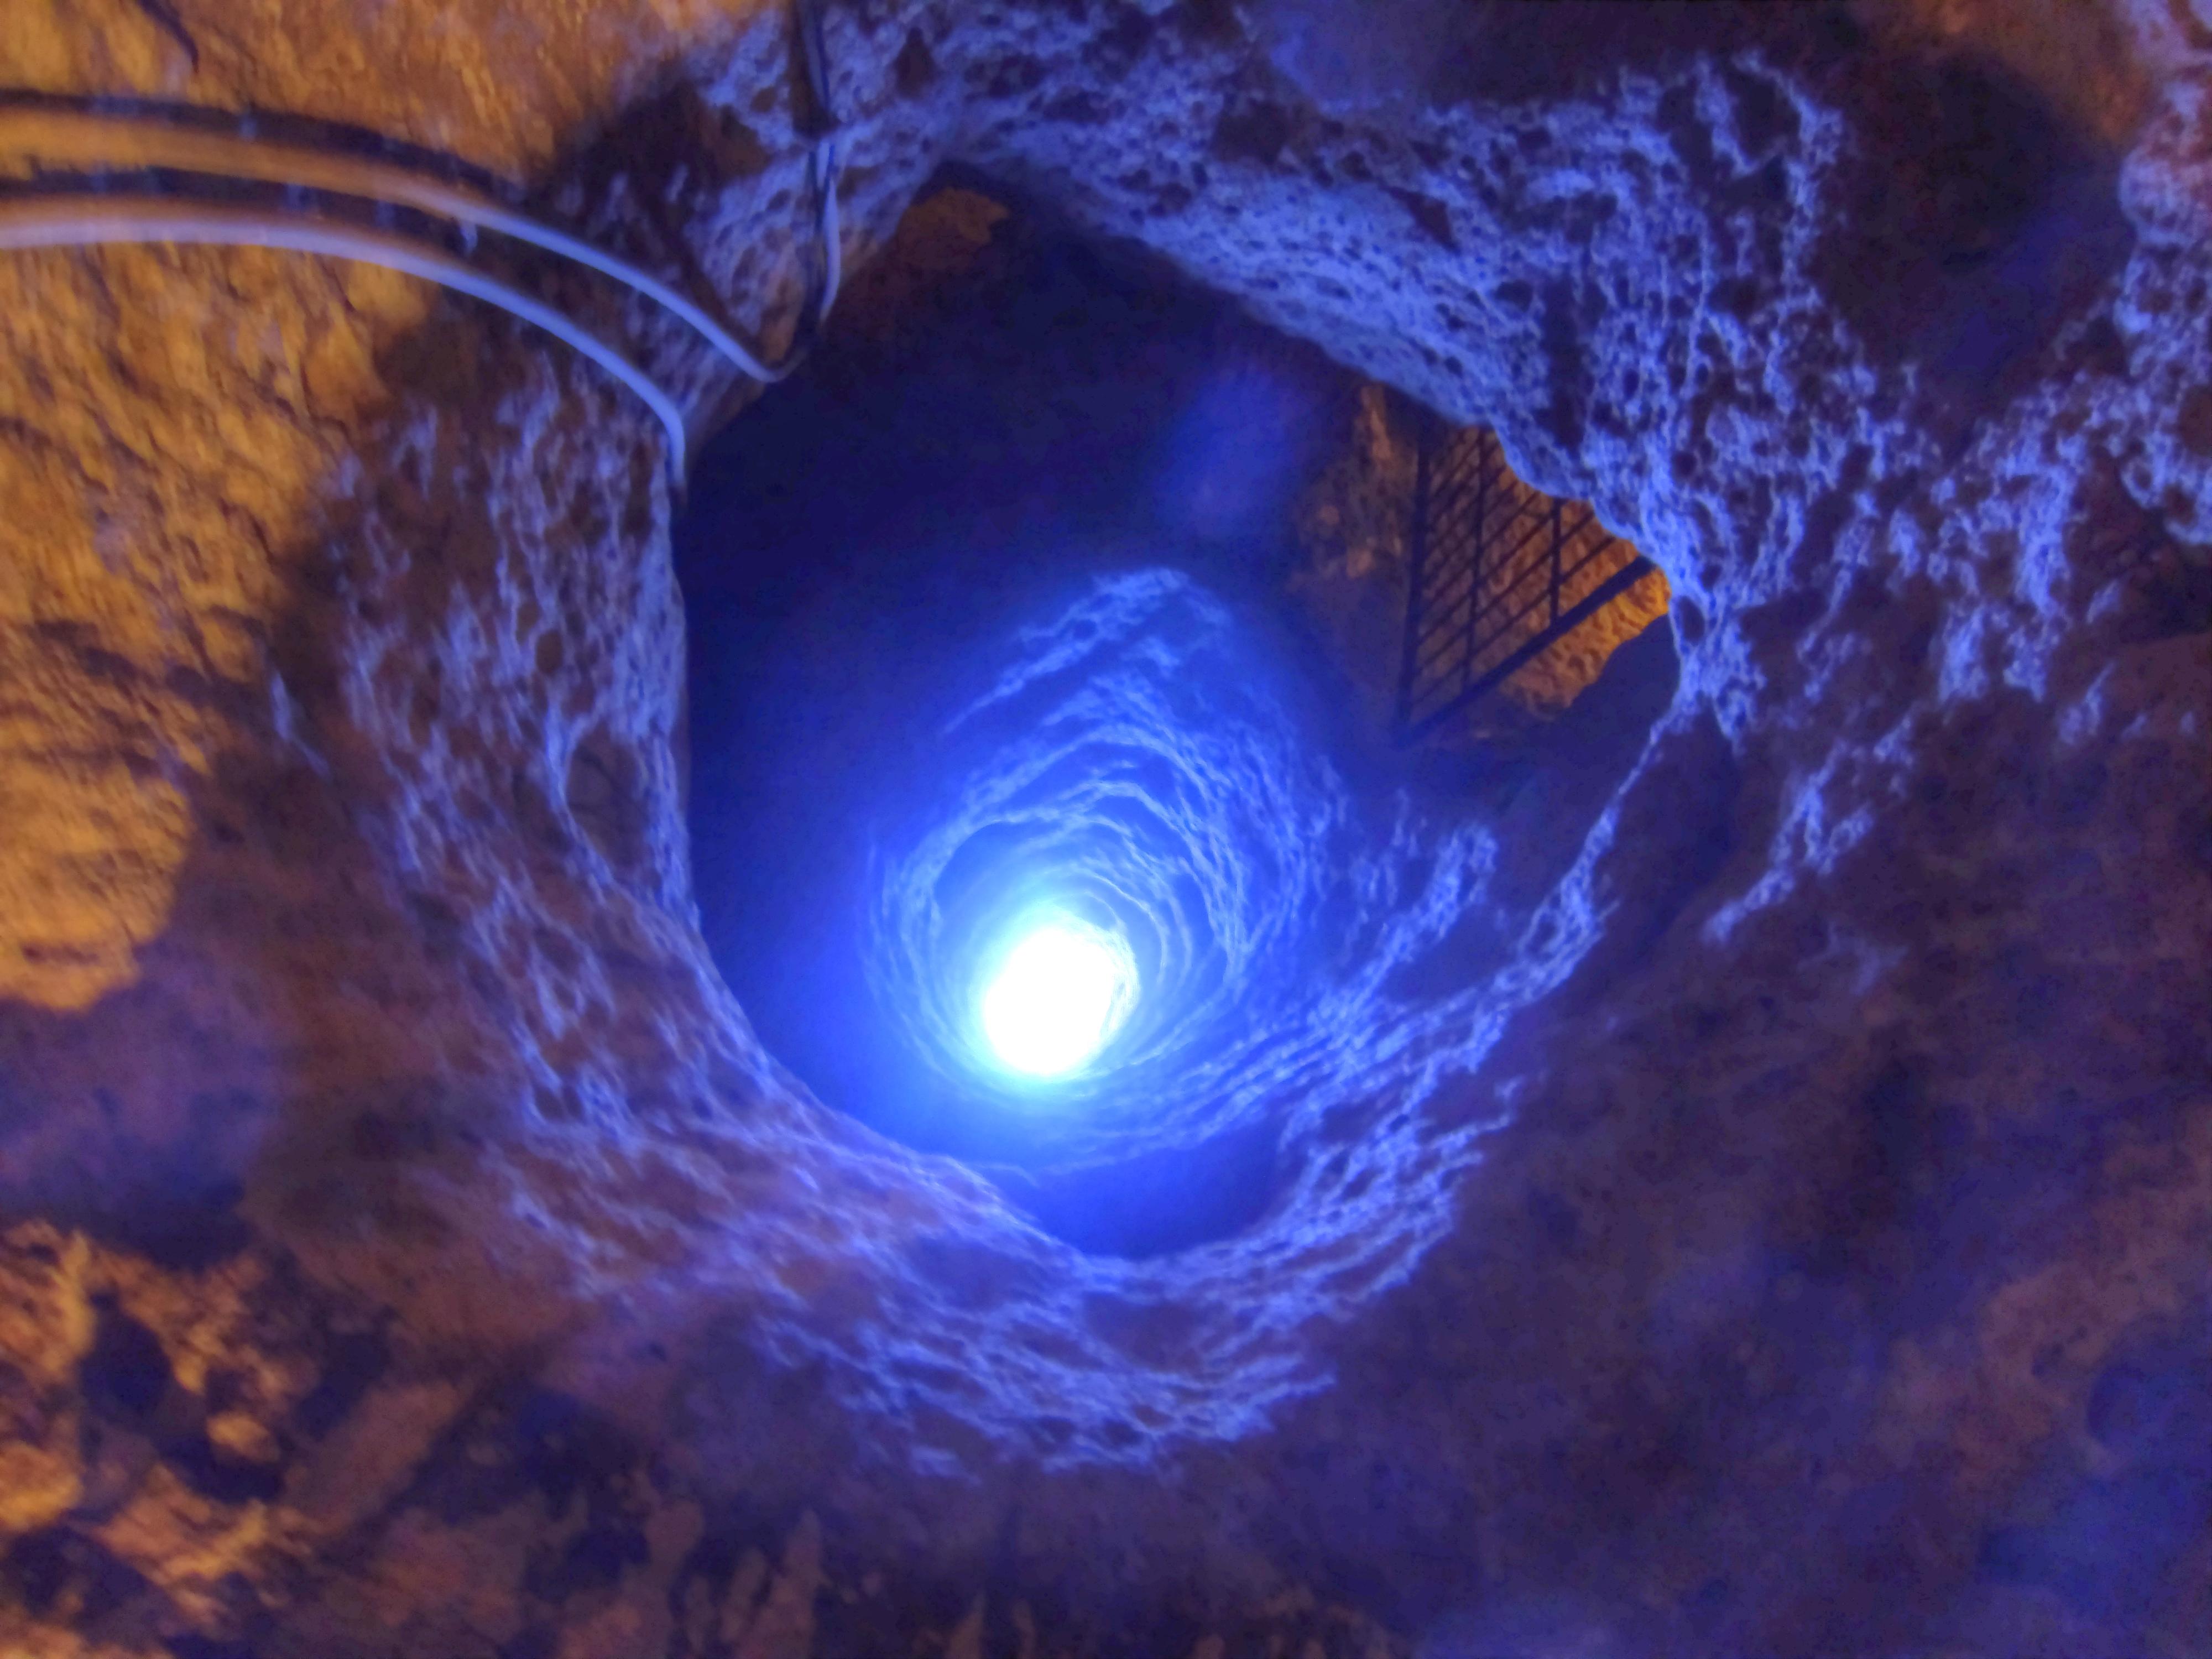 ... Derinkuyu Underground City 9834 Nevit Enhancer.jpg - Wikimedia Commons: commons.wikimedia.org/wiki/file:derinkuyu_underground_city_9834...